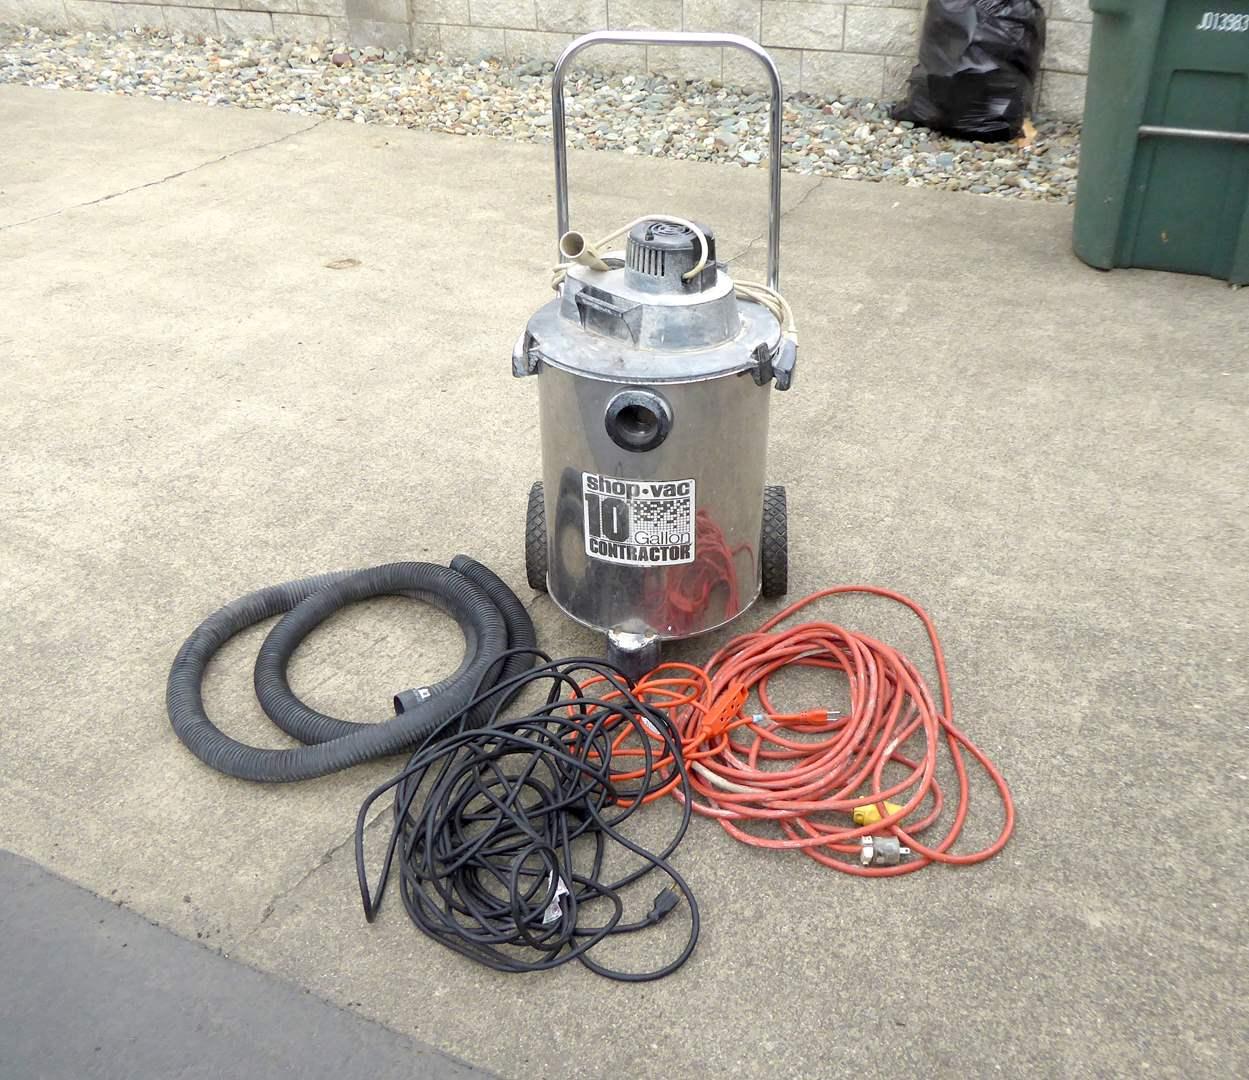 Lot # 8 - 10 Gallon Contractor Shop Vac  (main image)